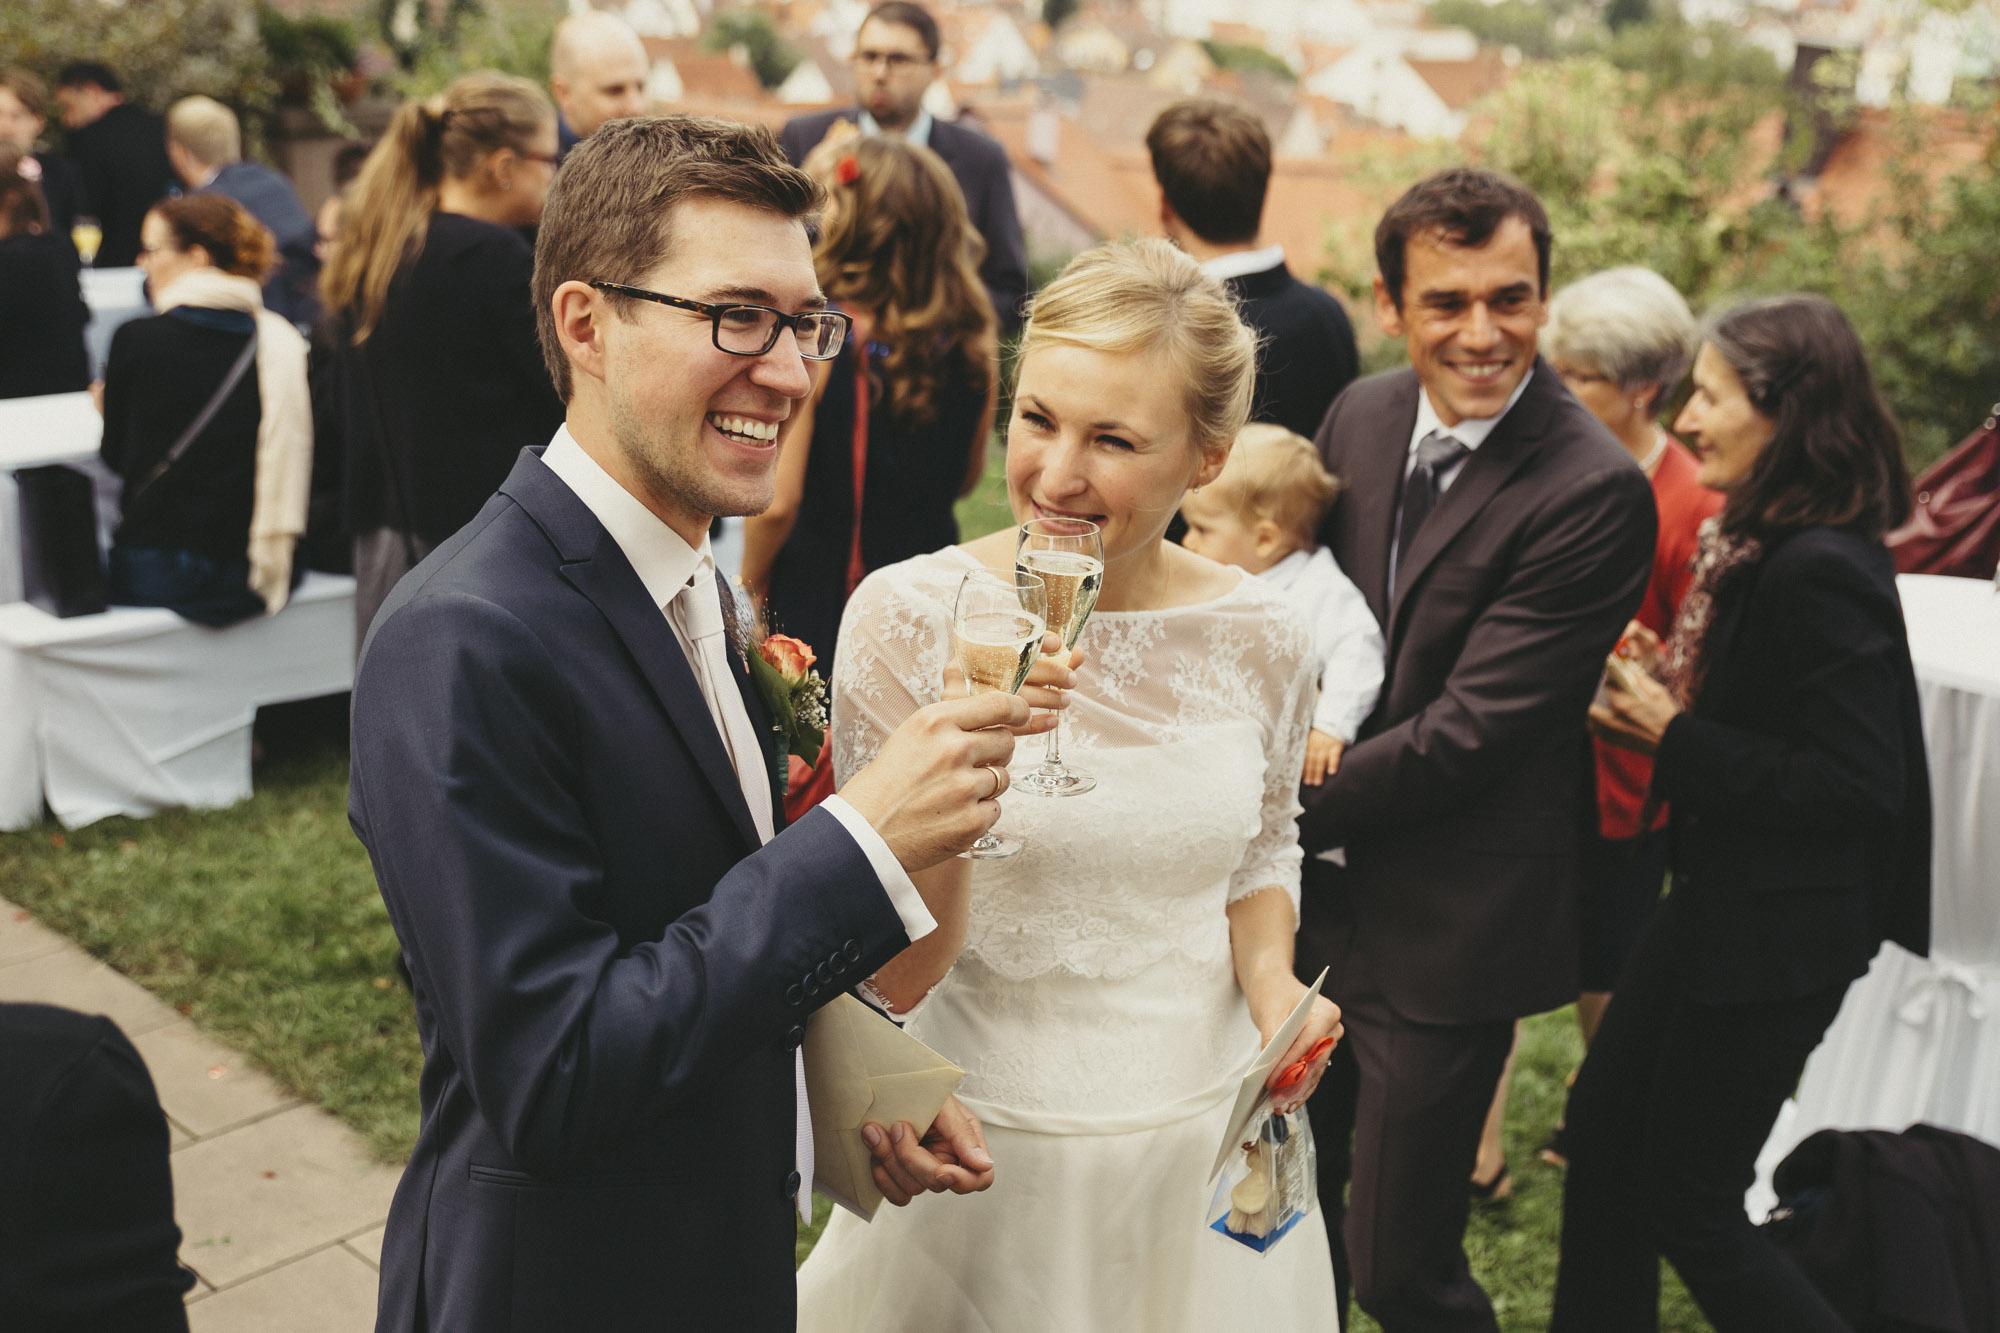 Hochzeitsfotografie-Tuebingen-Doro-Stefan-33